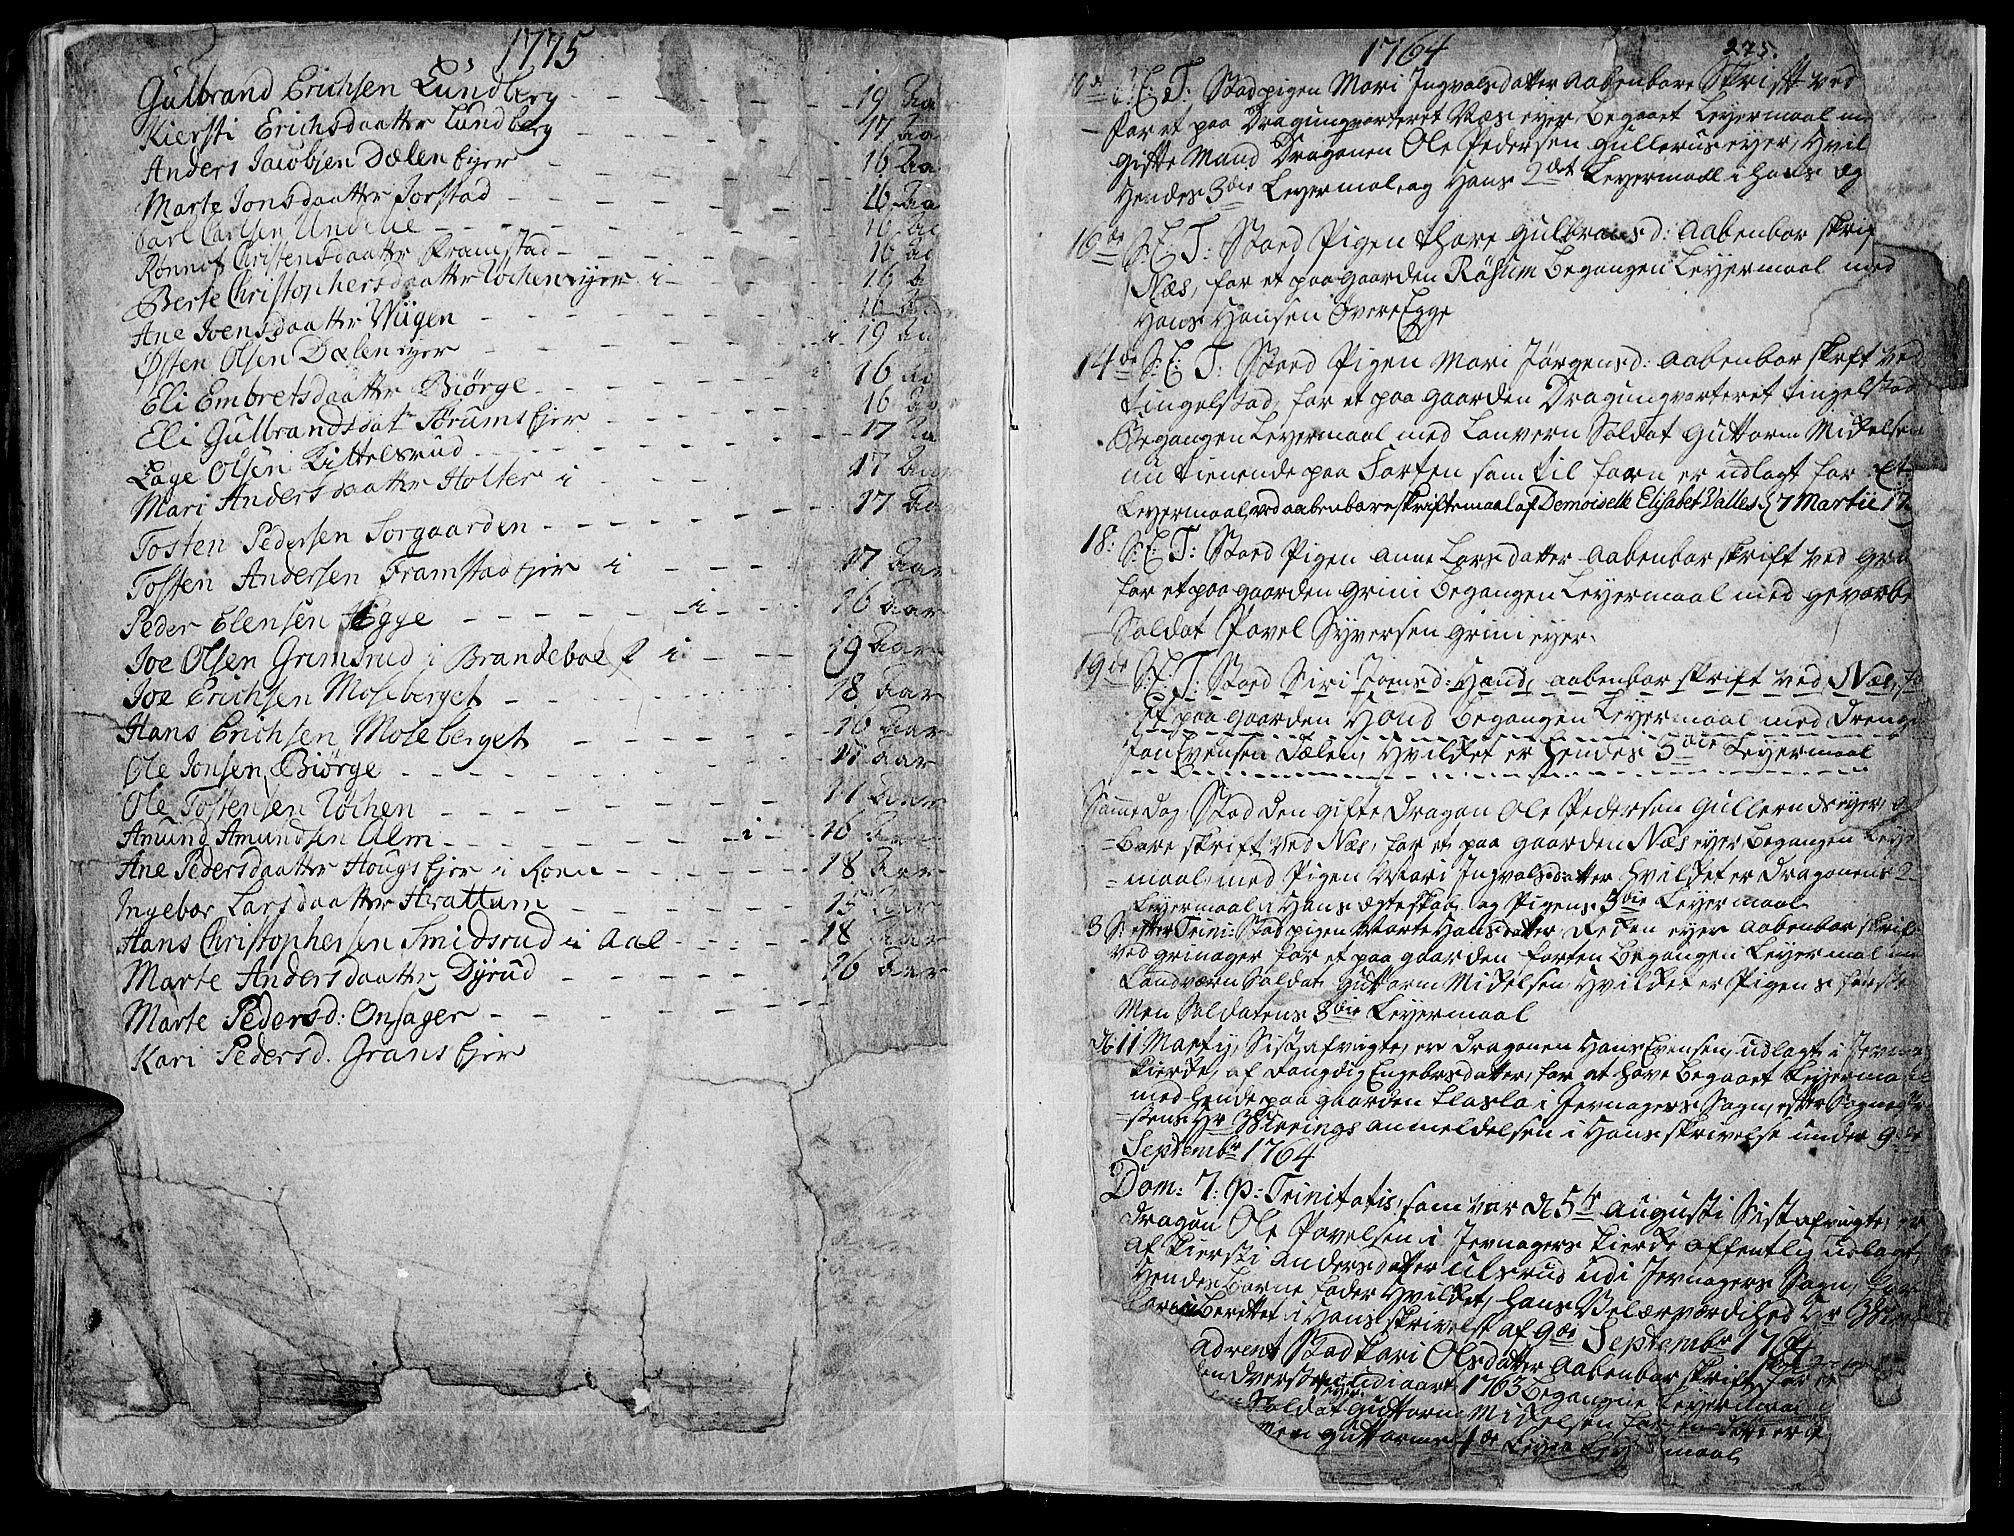 SAH, Gran prestekontor, Ministerialbok nr. 4, 1759-1775, s. 275